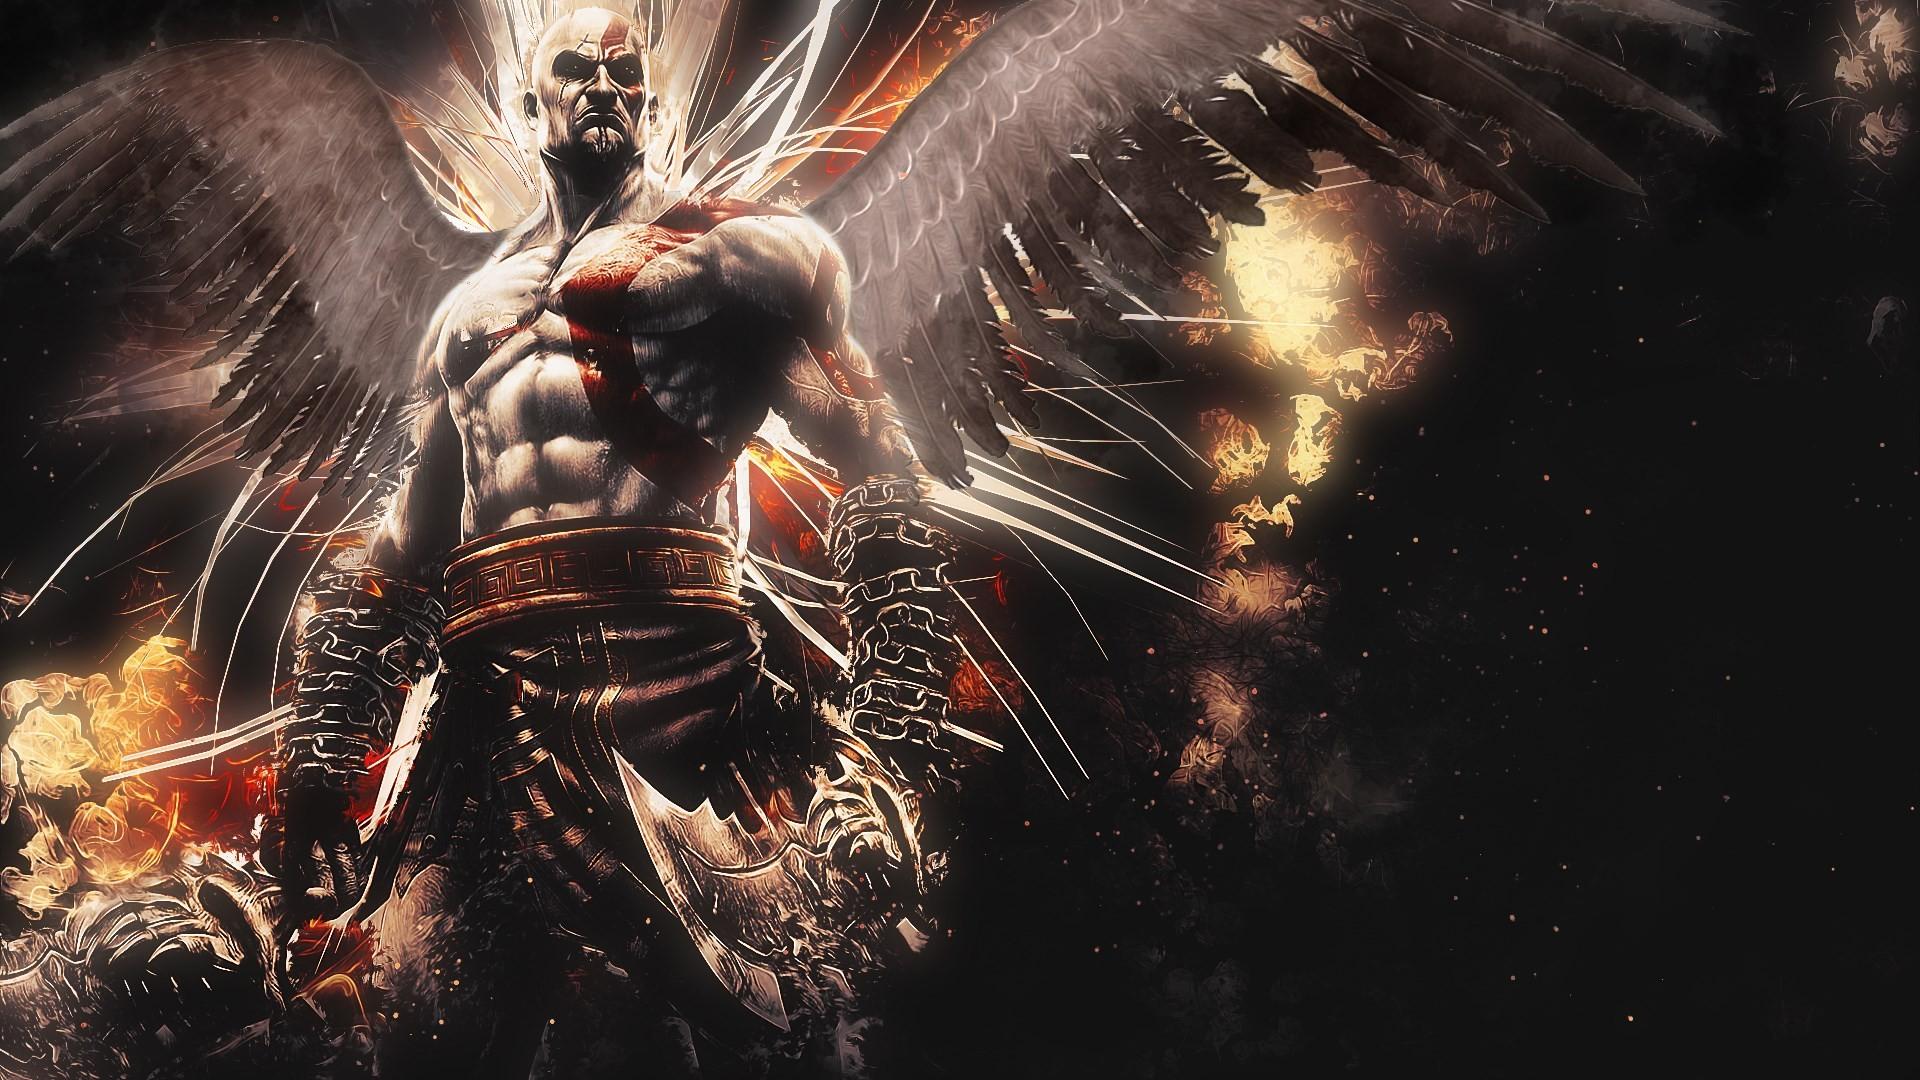 god of war backgrounds A1